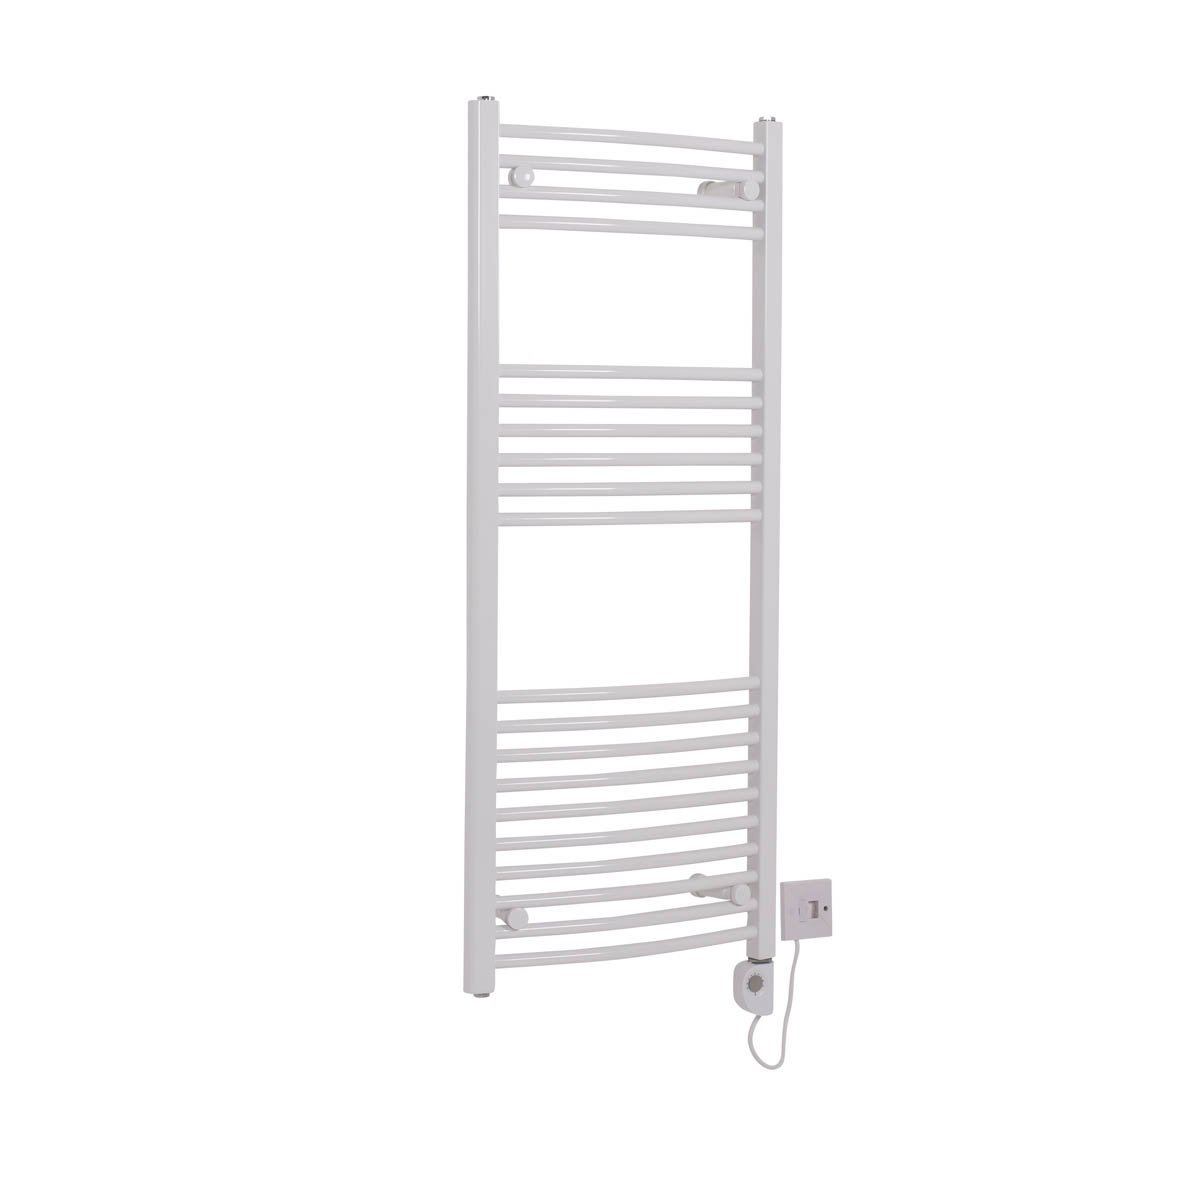 Bathroom White Electric Ladder Heated Towel Rail Warmer Thermostatic Radiator